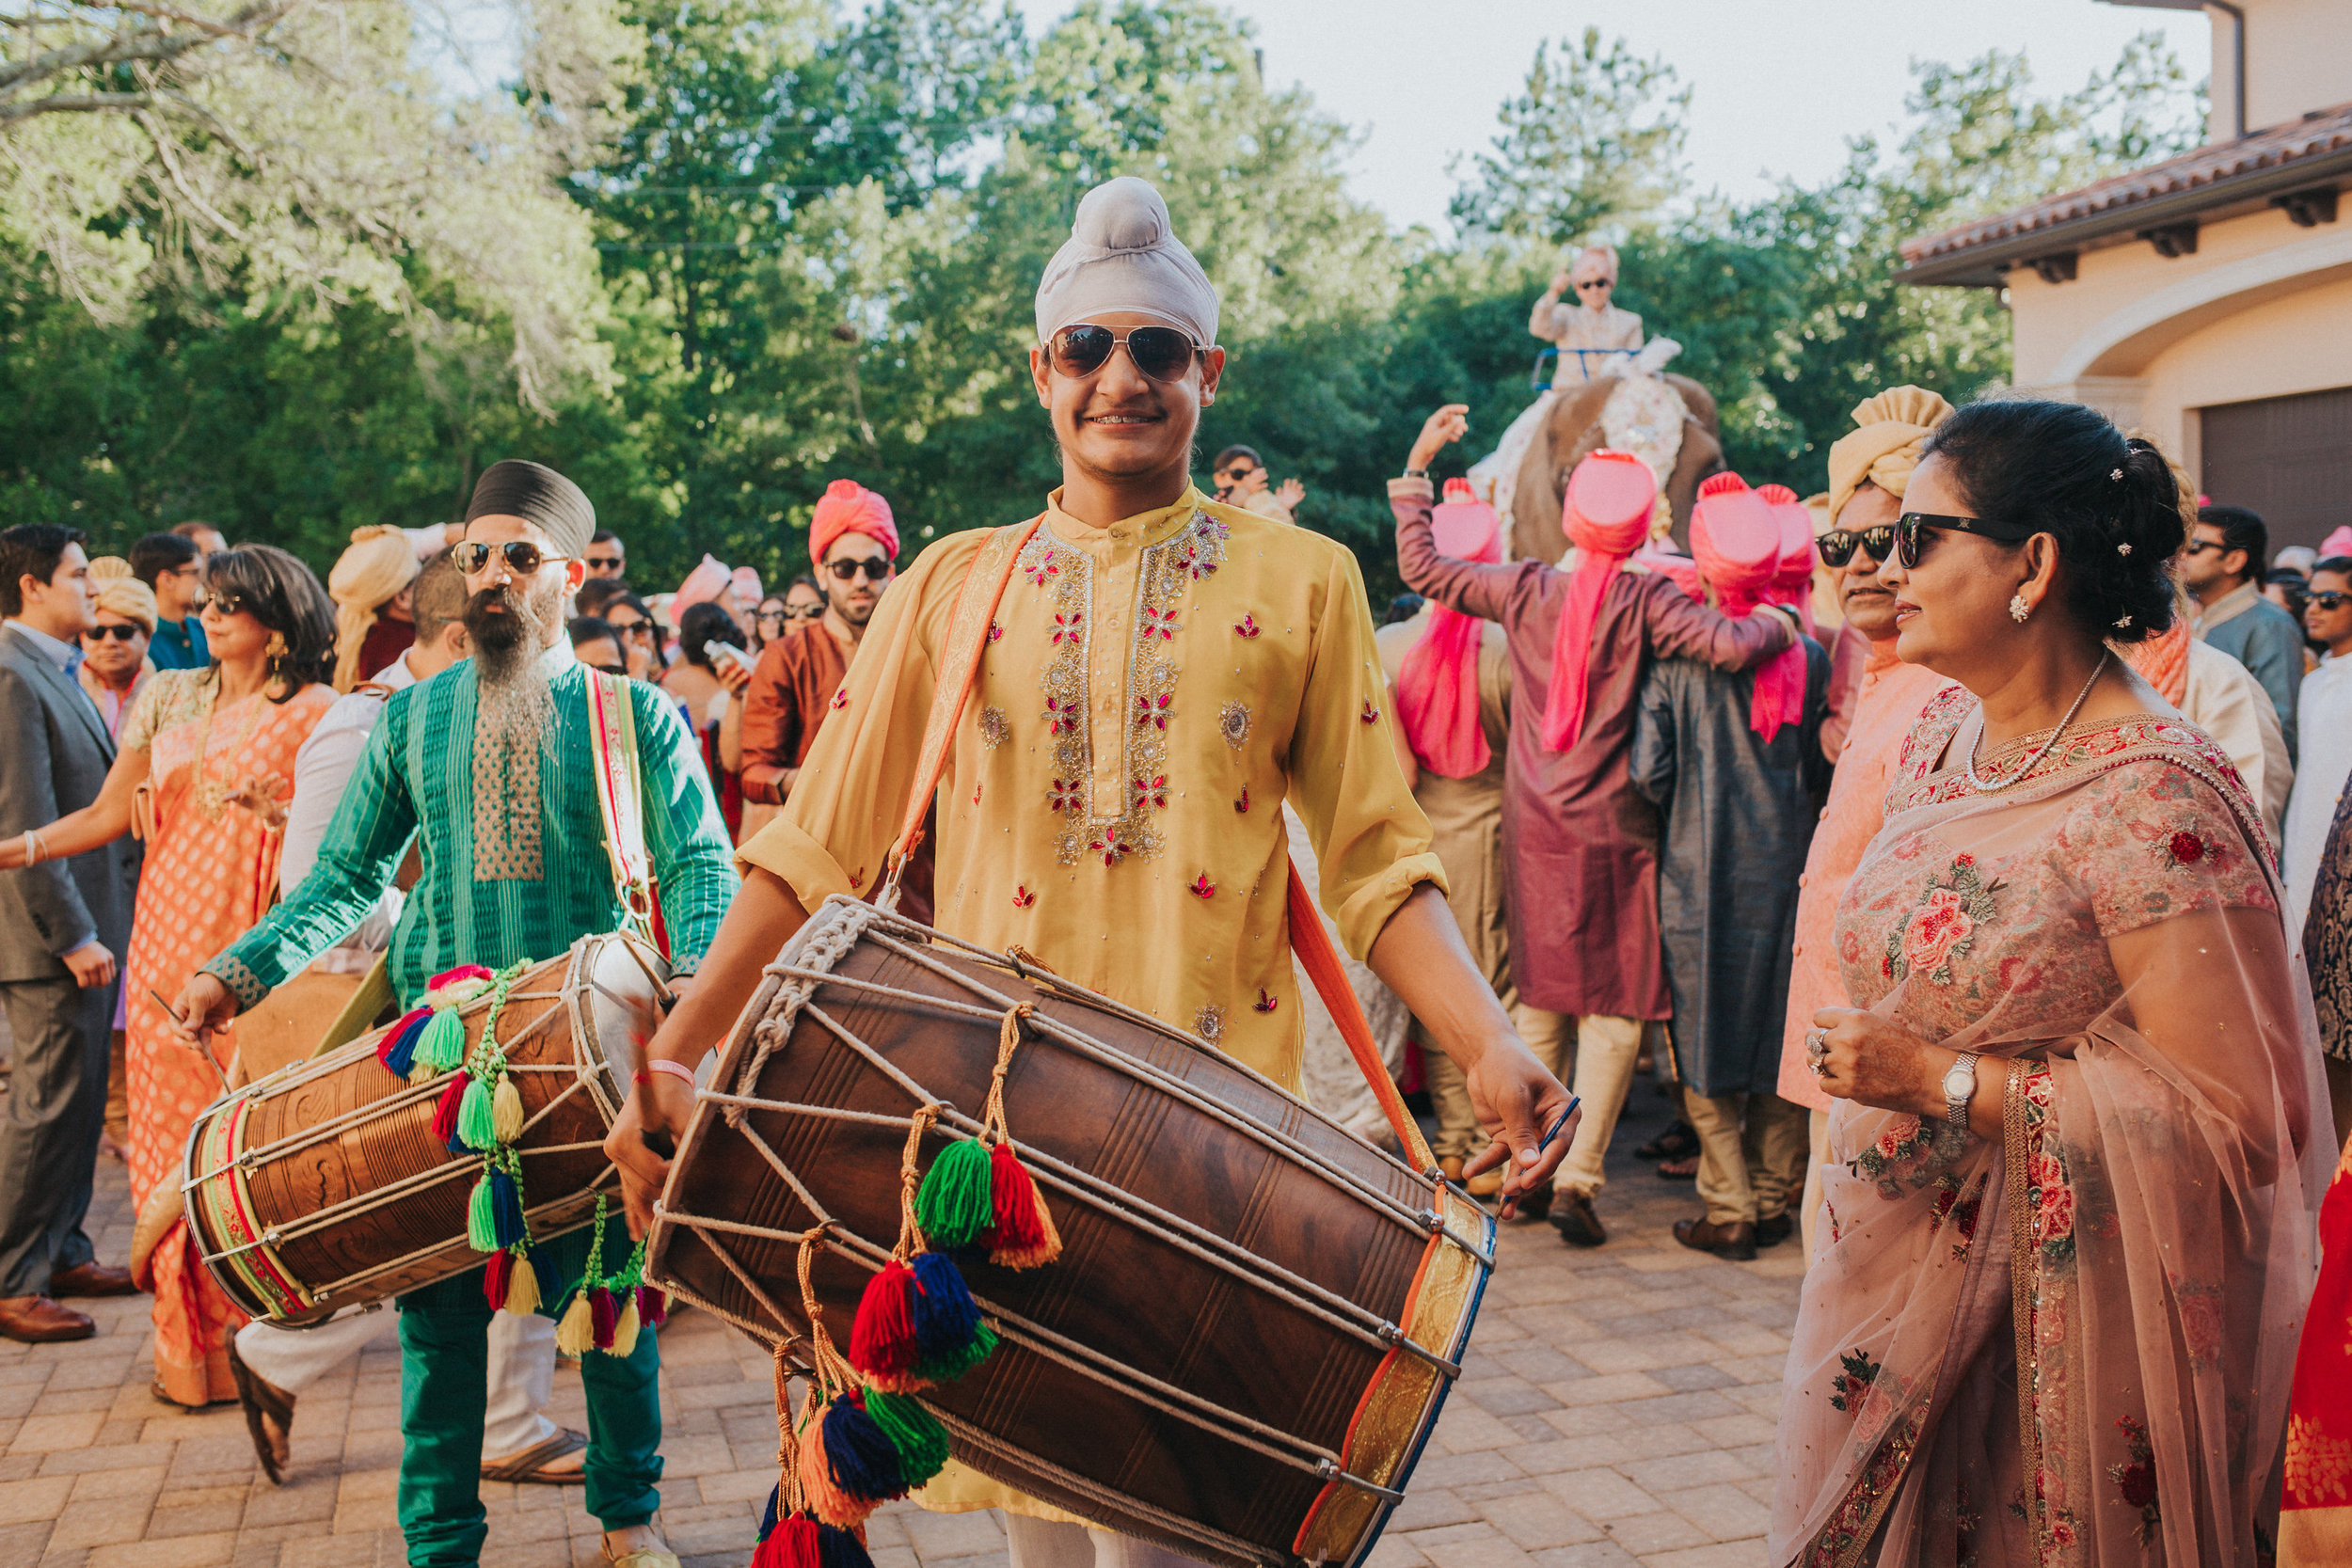 houston-weddings-khushbu-kevin-13.jpg